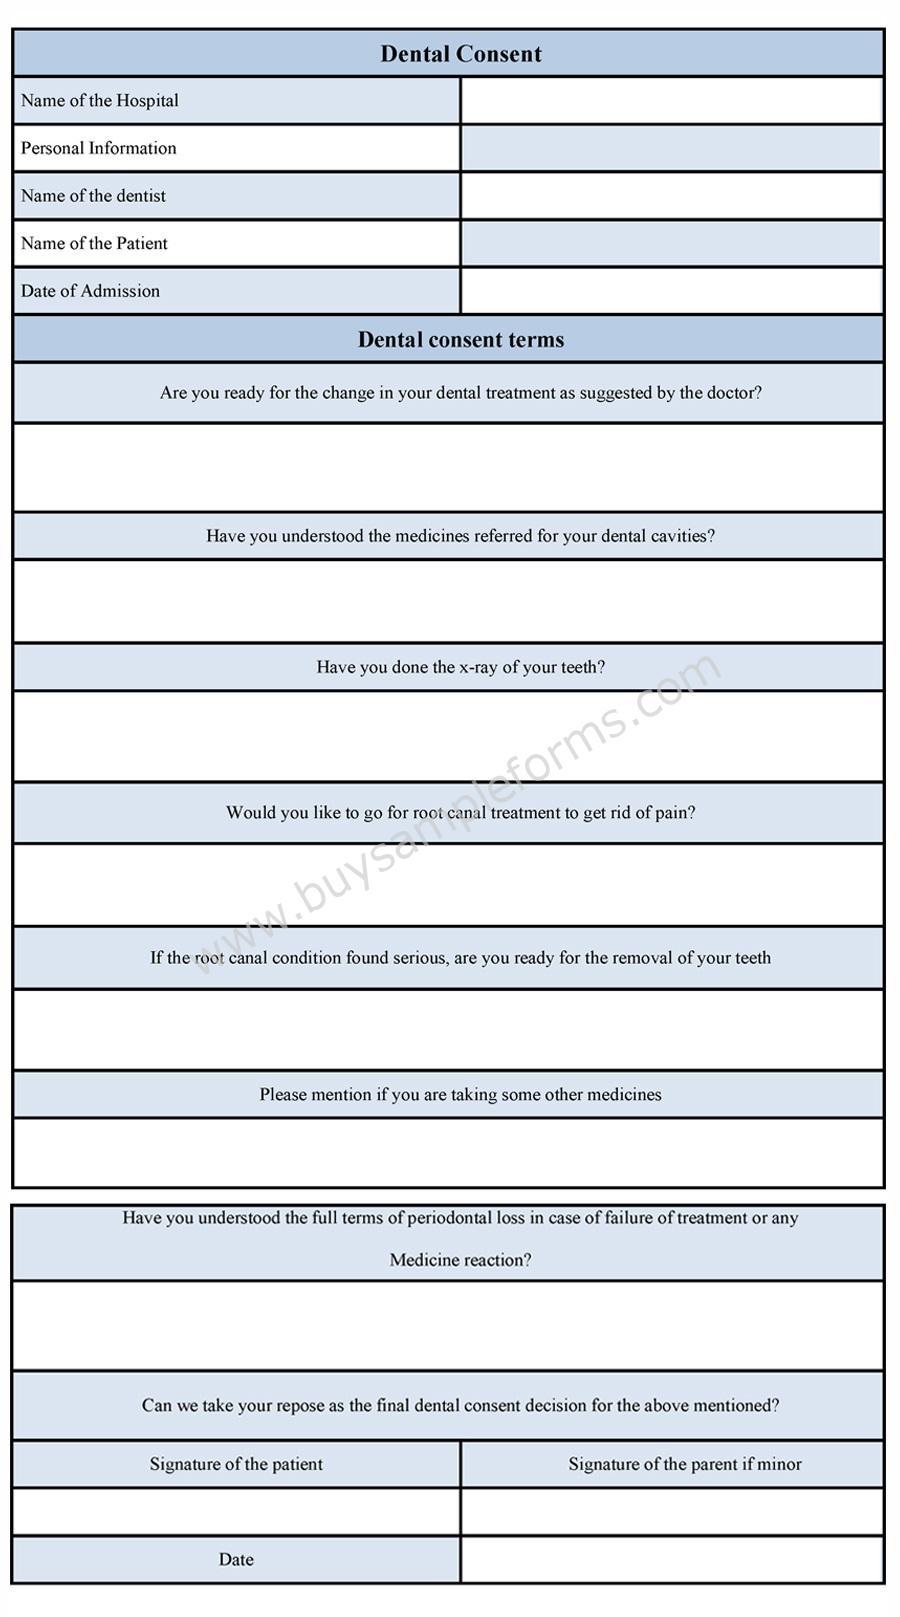 Dental consent form sample